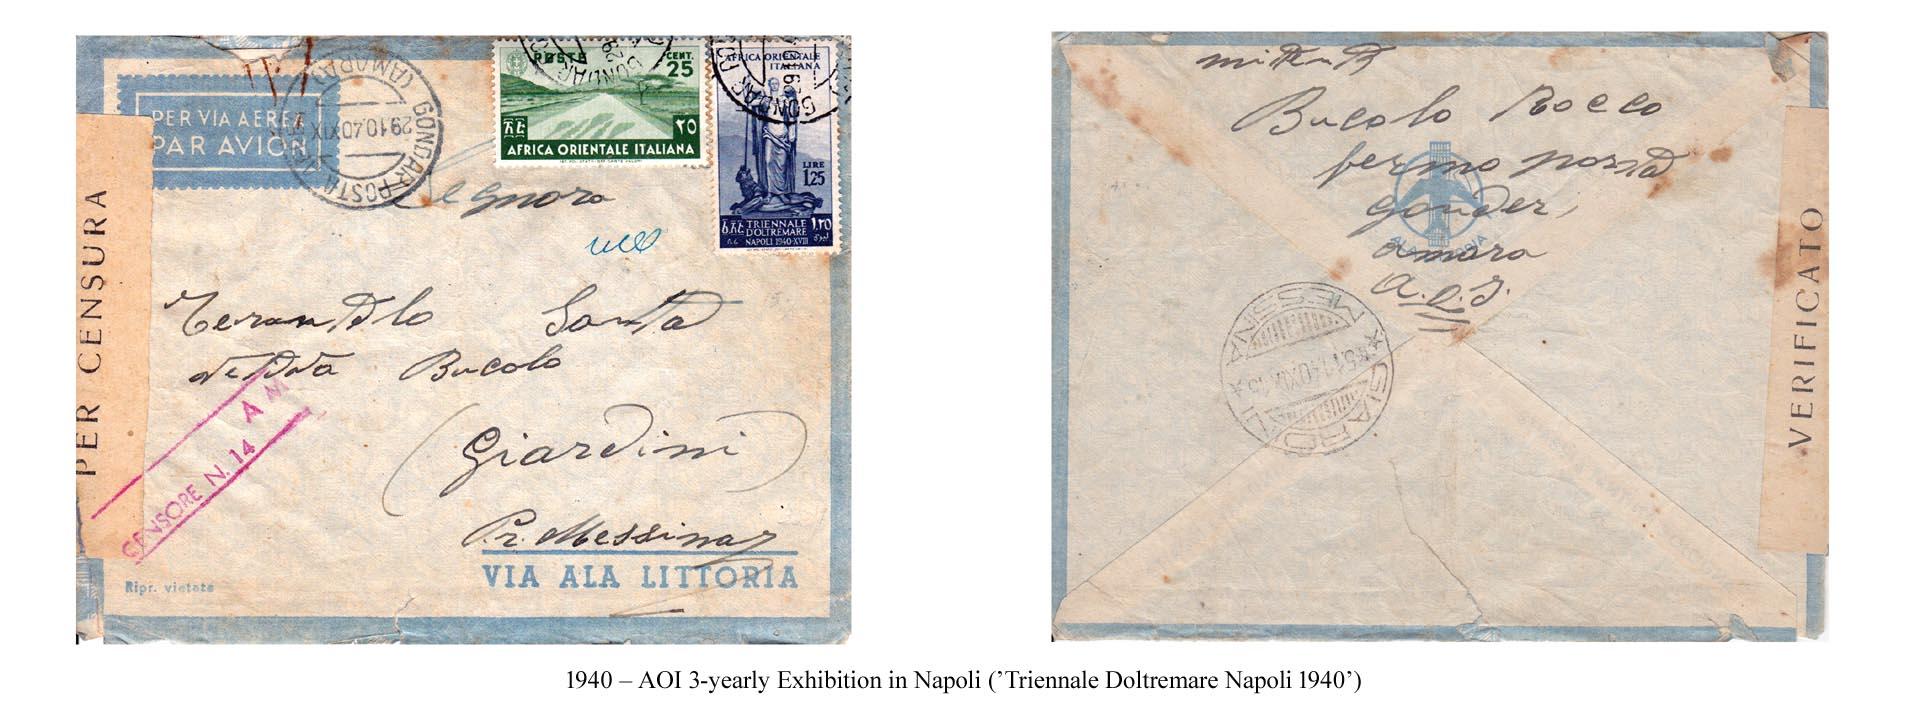 1940 – AOI 3-yearly Exhibition in Napoli (Triennale Doltremare Napoli 1940) 2